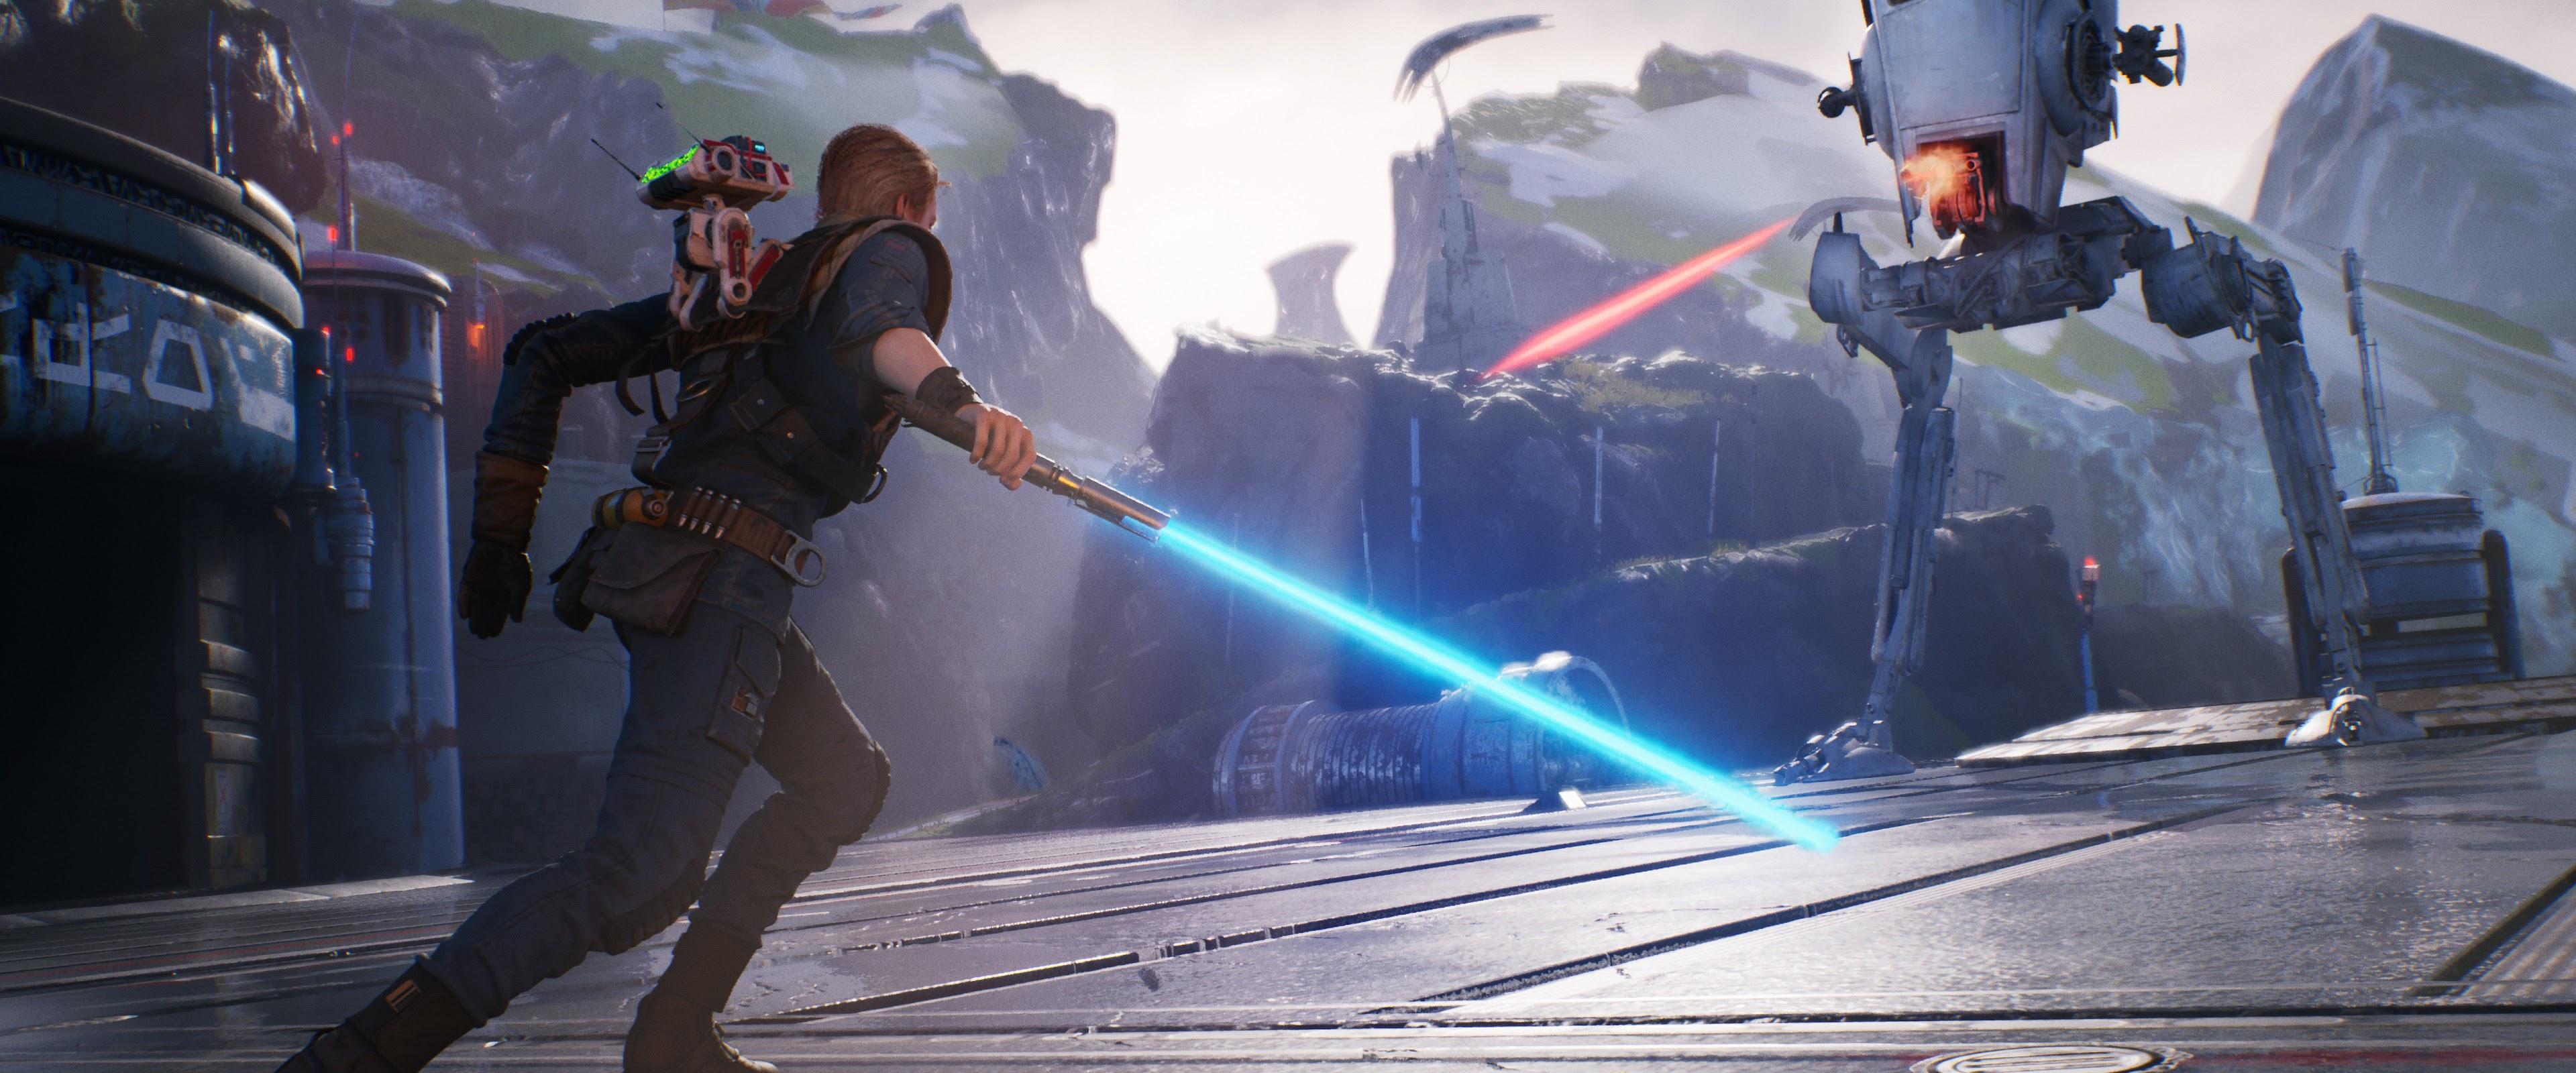 Star Wars Jedi Fallen Order Lightsaber 4k Wallpaper 21